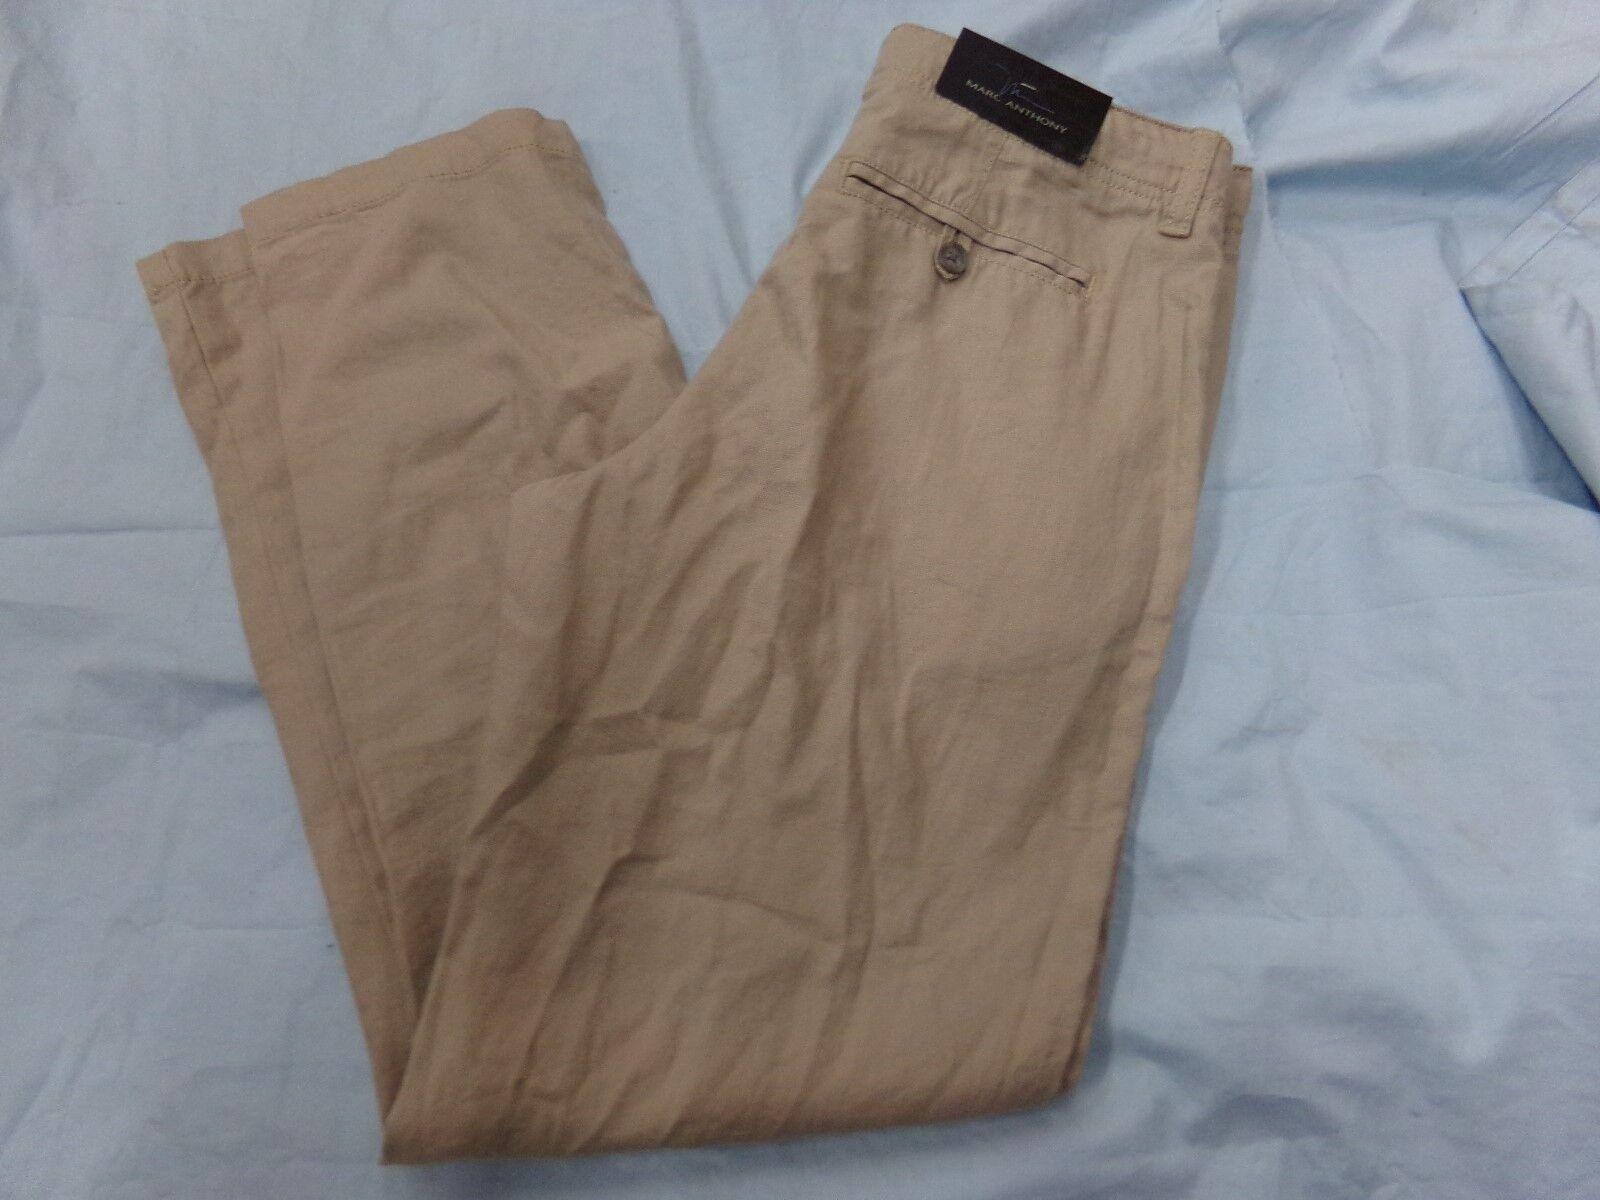 Mens Size 30x30 Marc Anthony Tan Linen Comfy Pants Slim Fit NEW